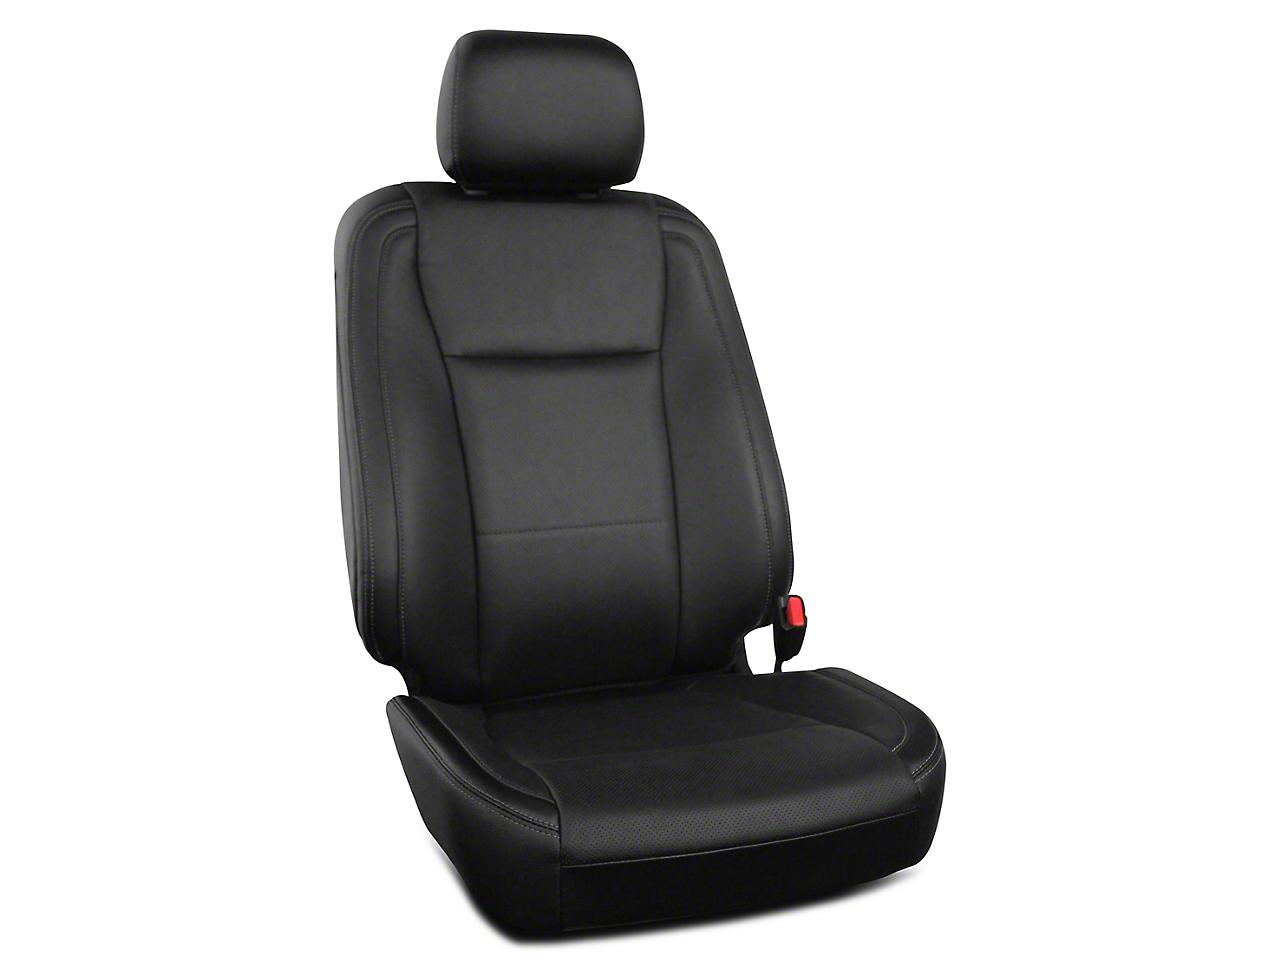 Roadwire Premium Leather Front Seat Covers - Black (15-18 F-150 XL, XLT, Platinum SuperCrew)